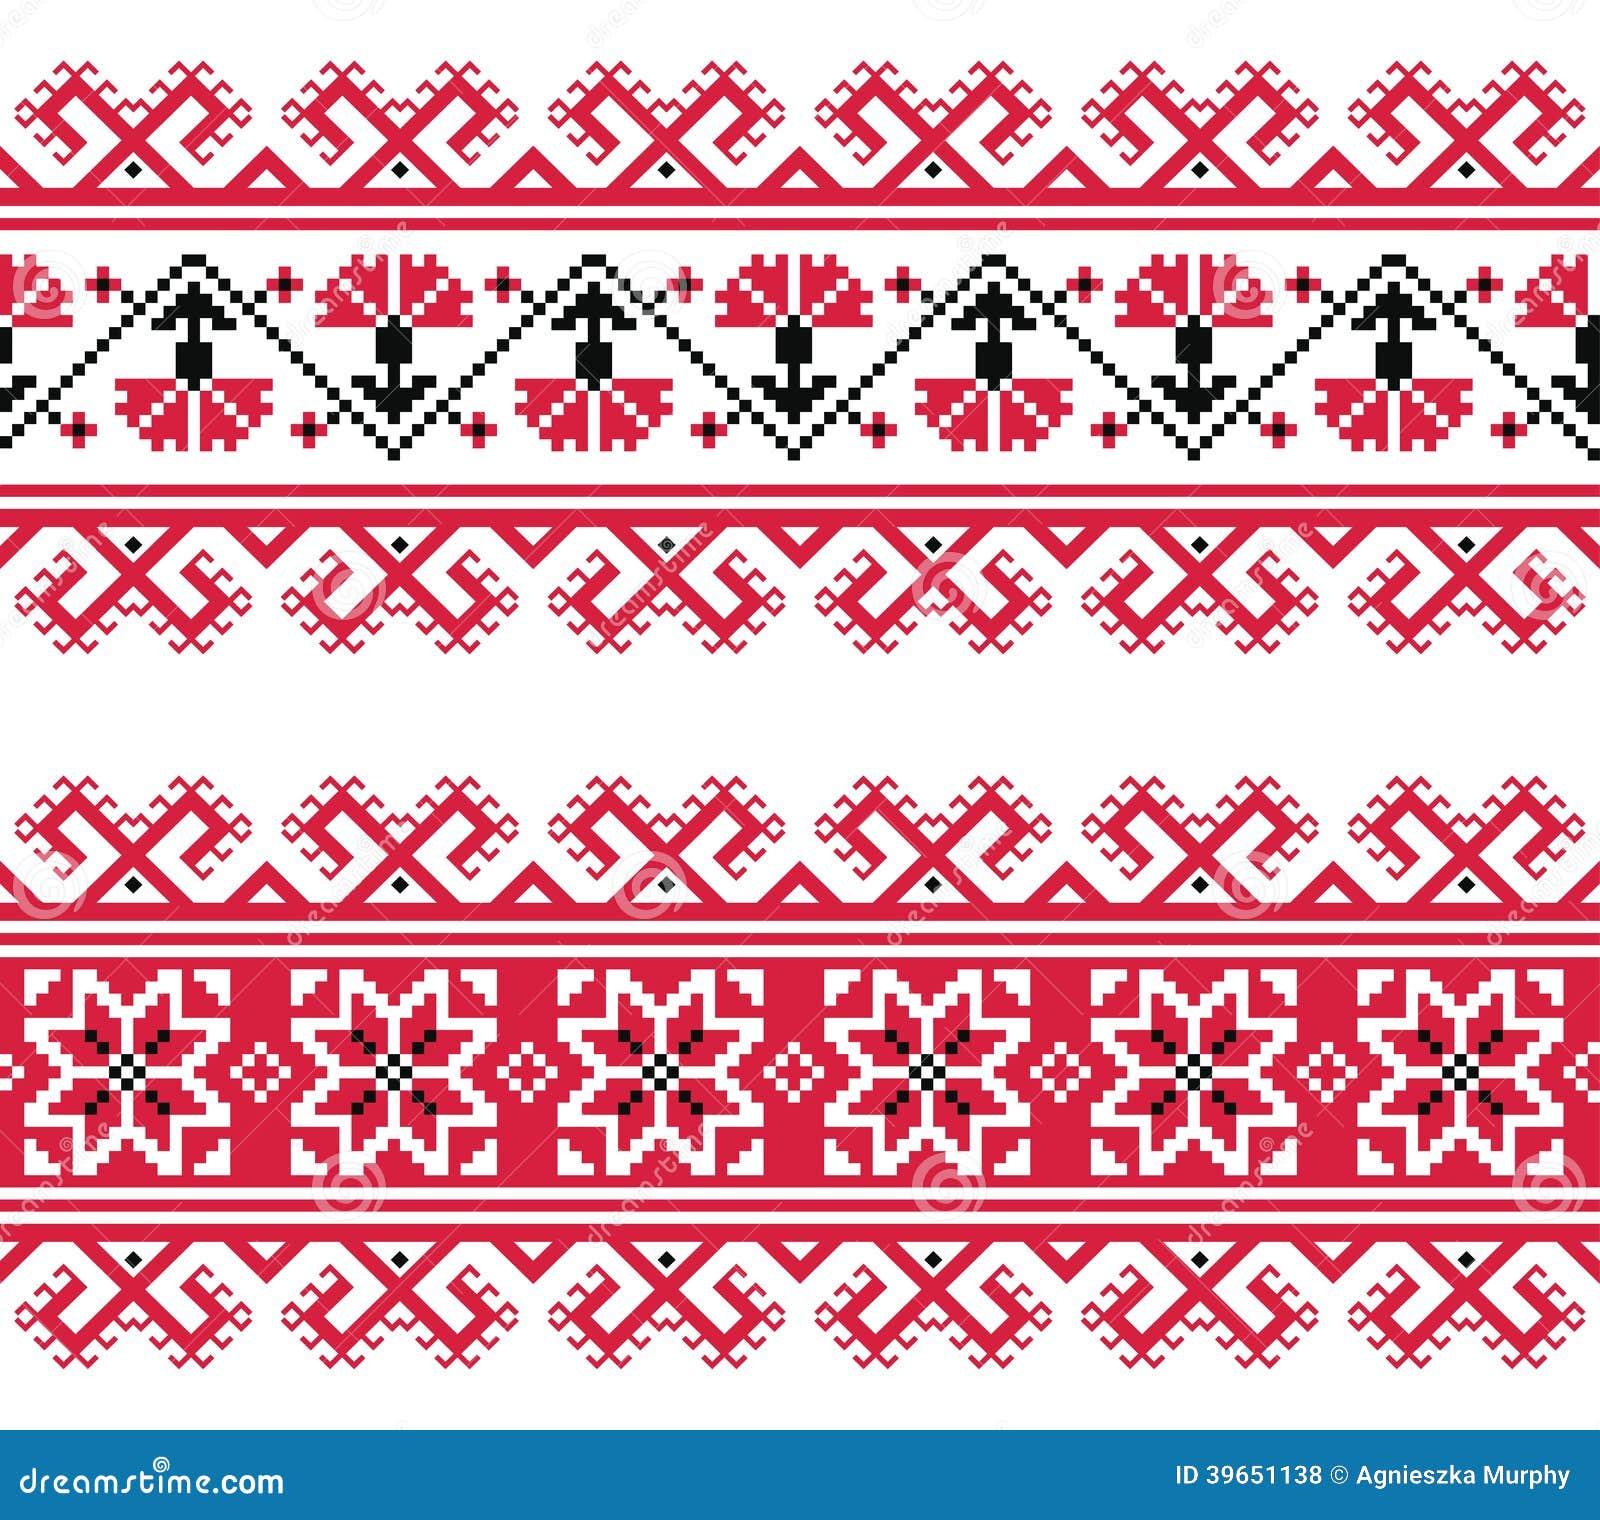 Ukrainian Embroidery Designs